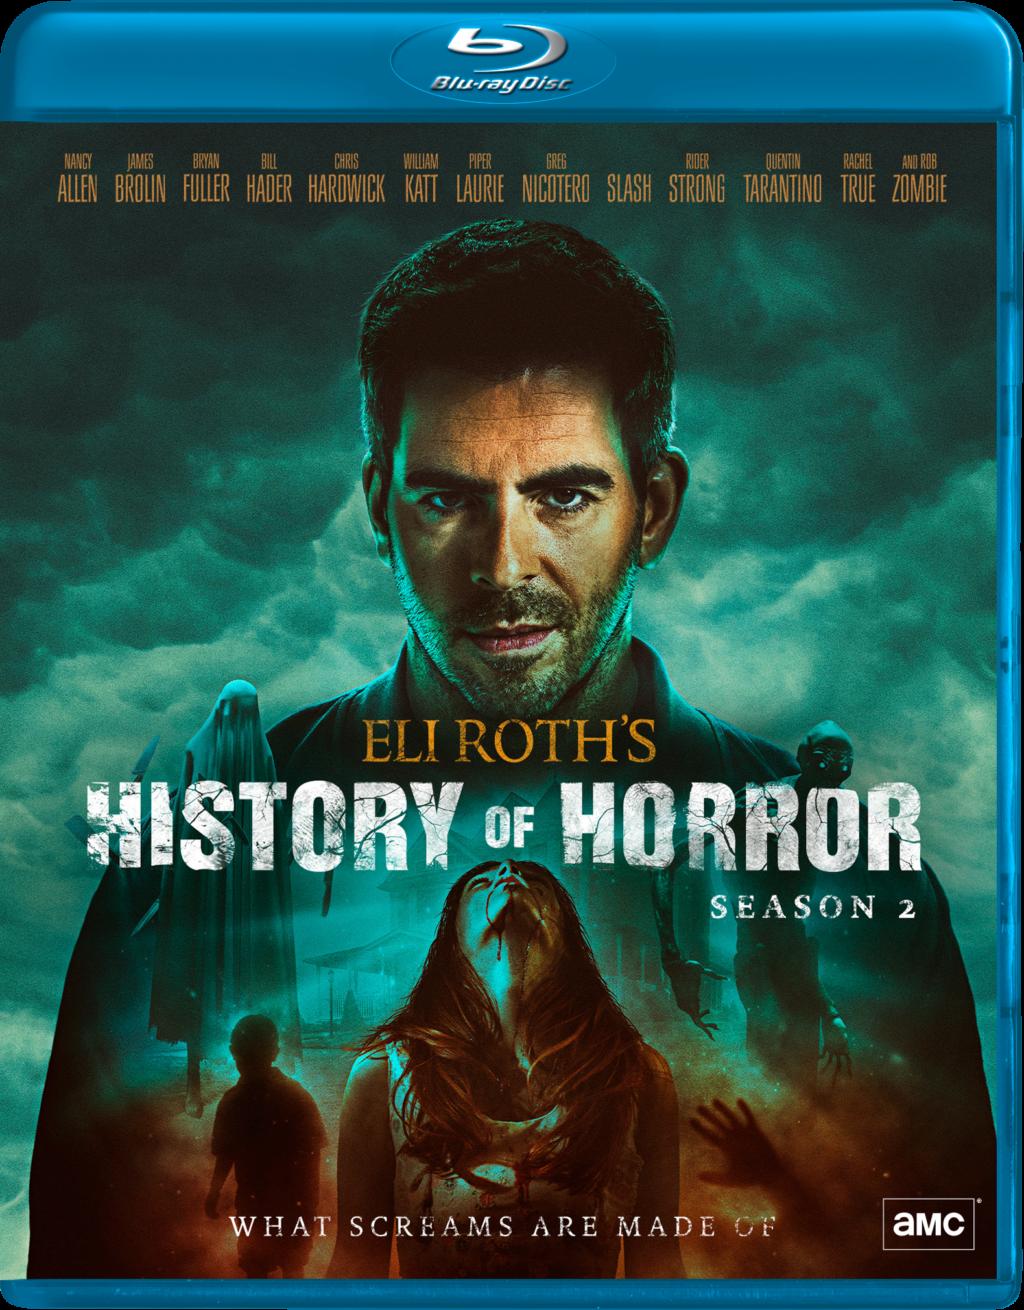 ELI ROTH S2 BD HIC 1024x1310 - Contest: Win a Copy of 'Eli Roth's History of Horror Season 2' on Blu-ray!